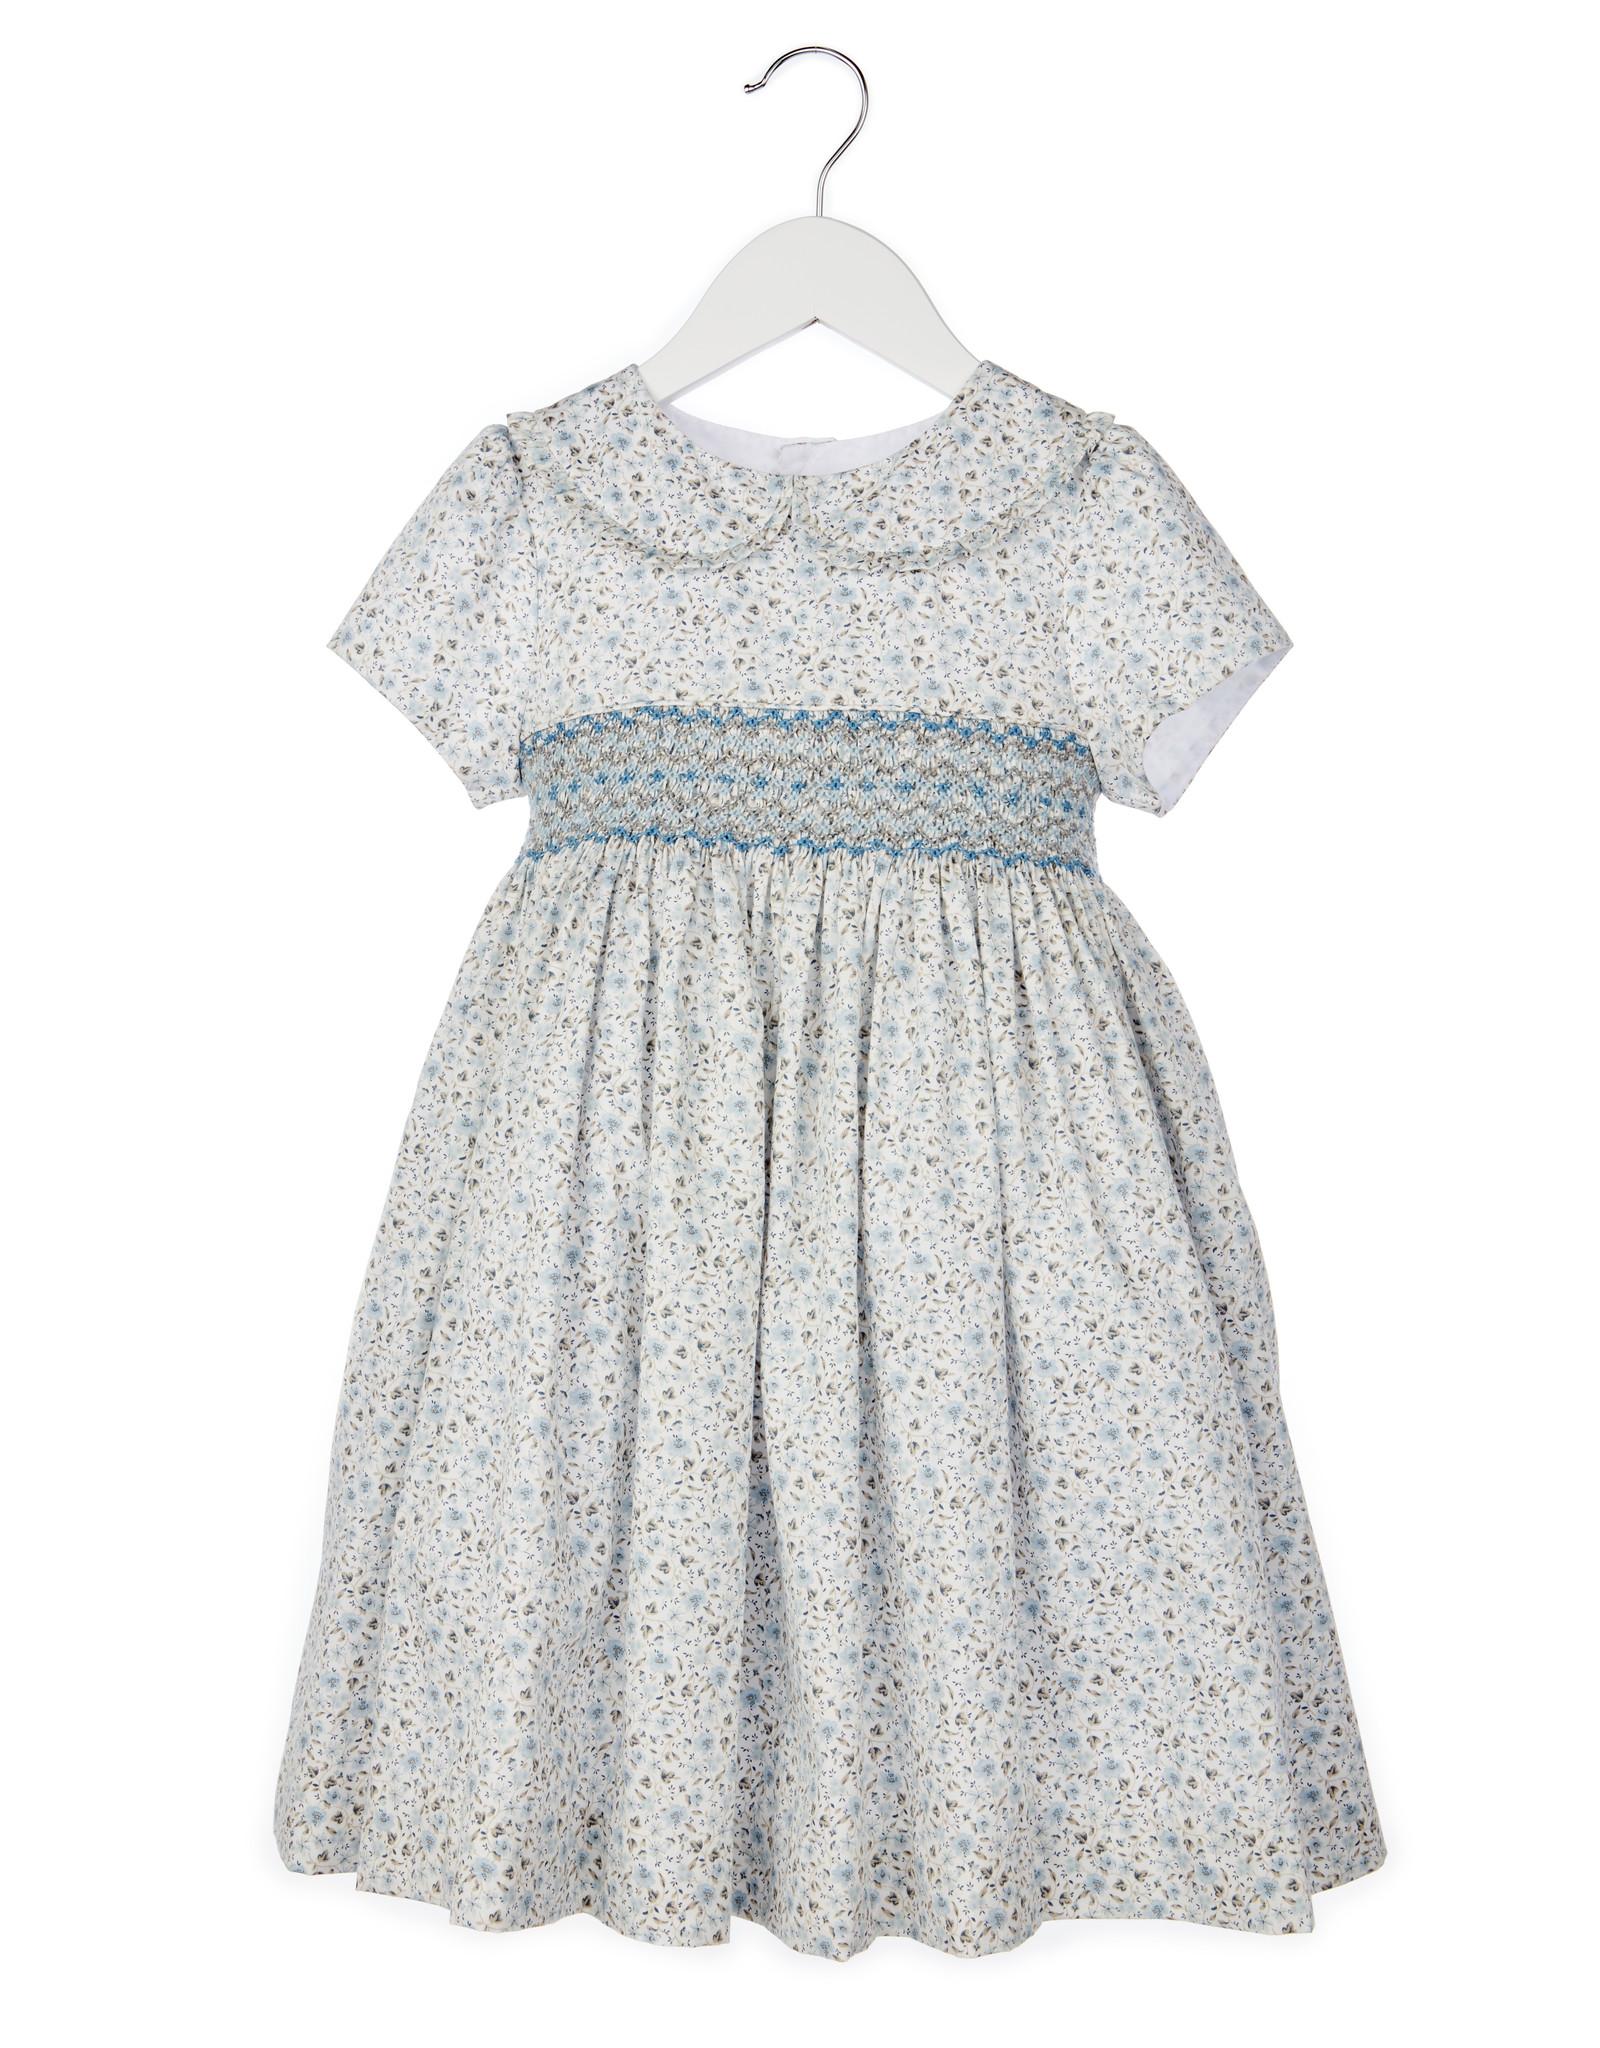 Luli Blue Grey Calico Print Smocked Dress